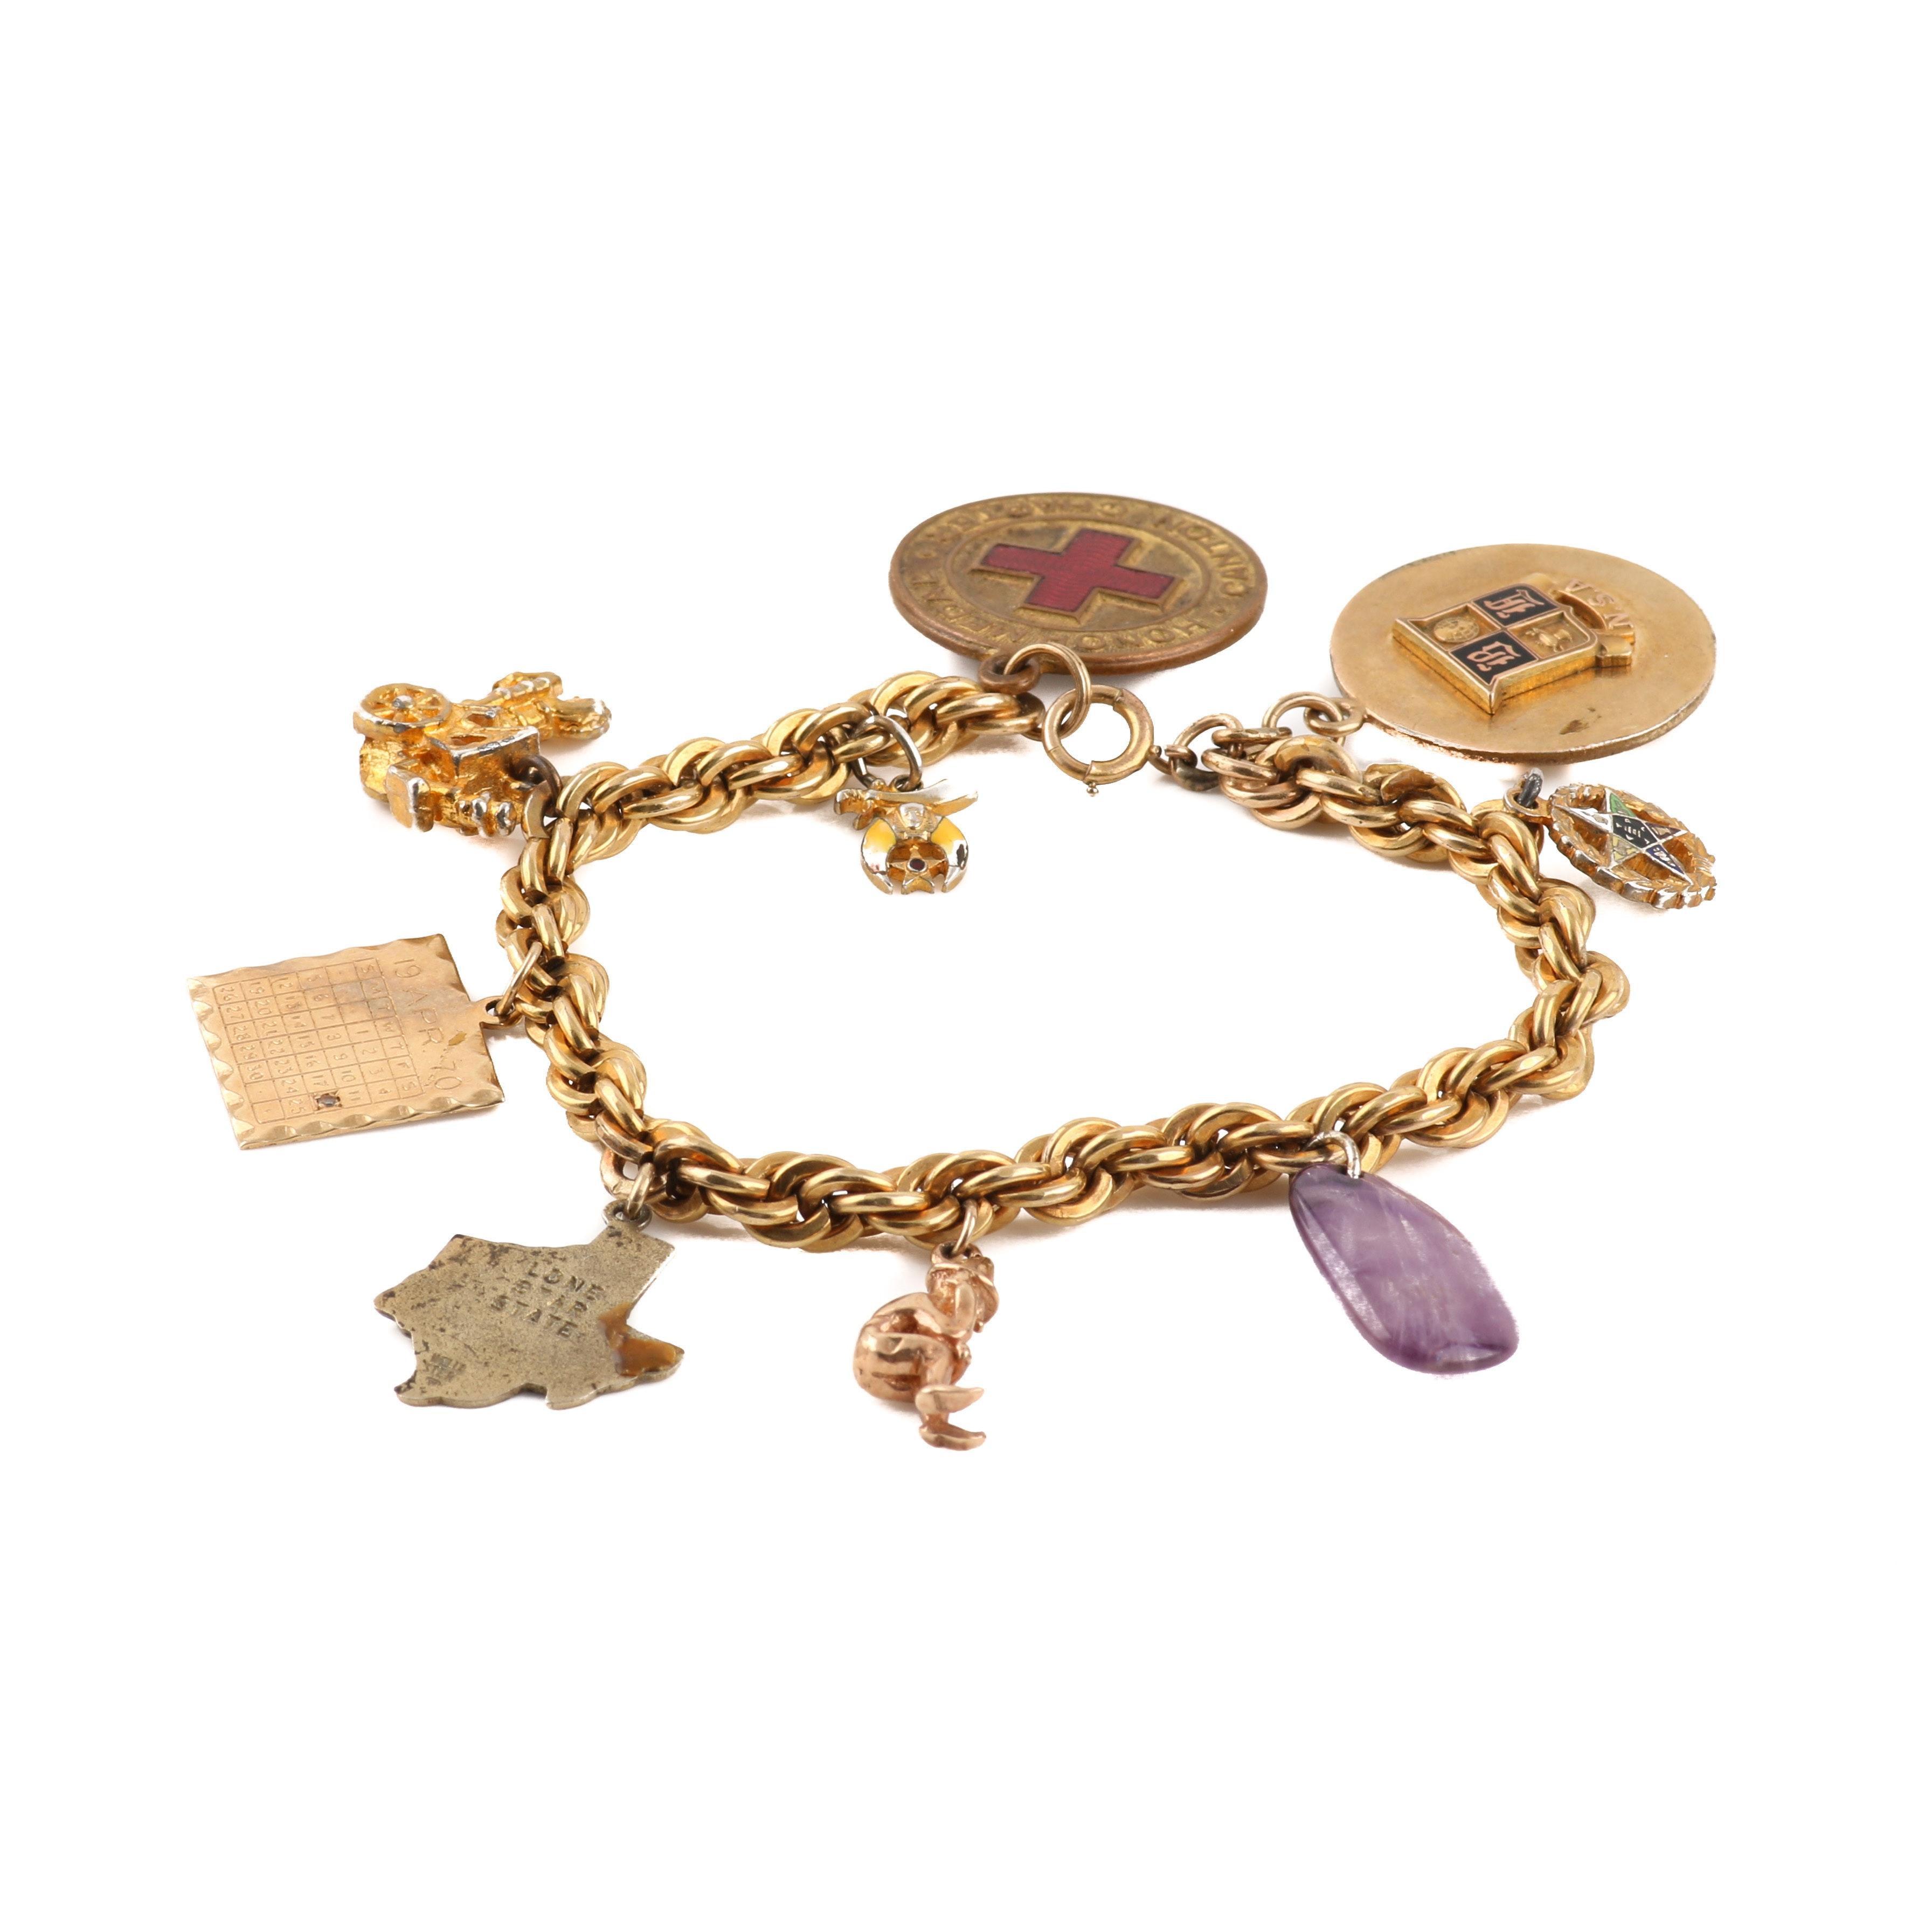 Gold-Filled Charm Bracelet Including an Amethyst Charm